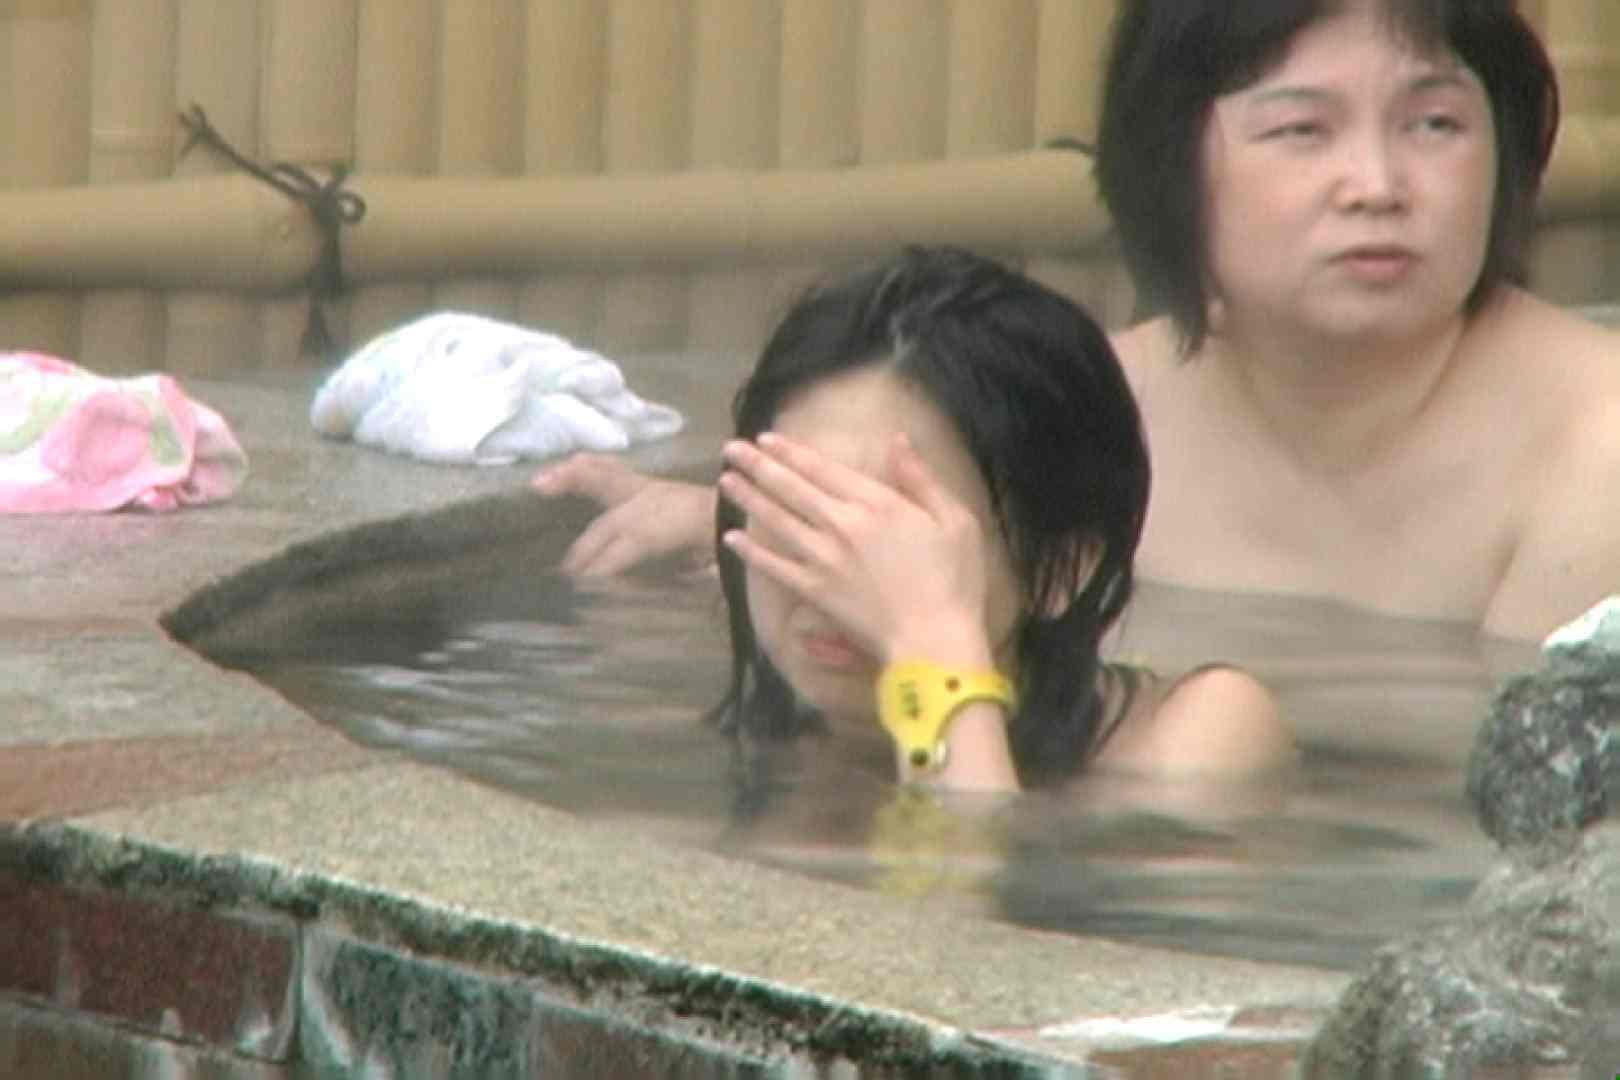 Aquaな露天風呂Vol.646 OLセックス  97画像 36